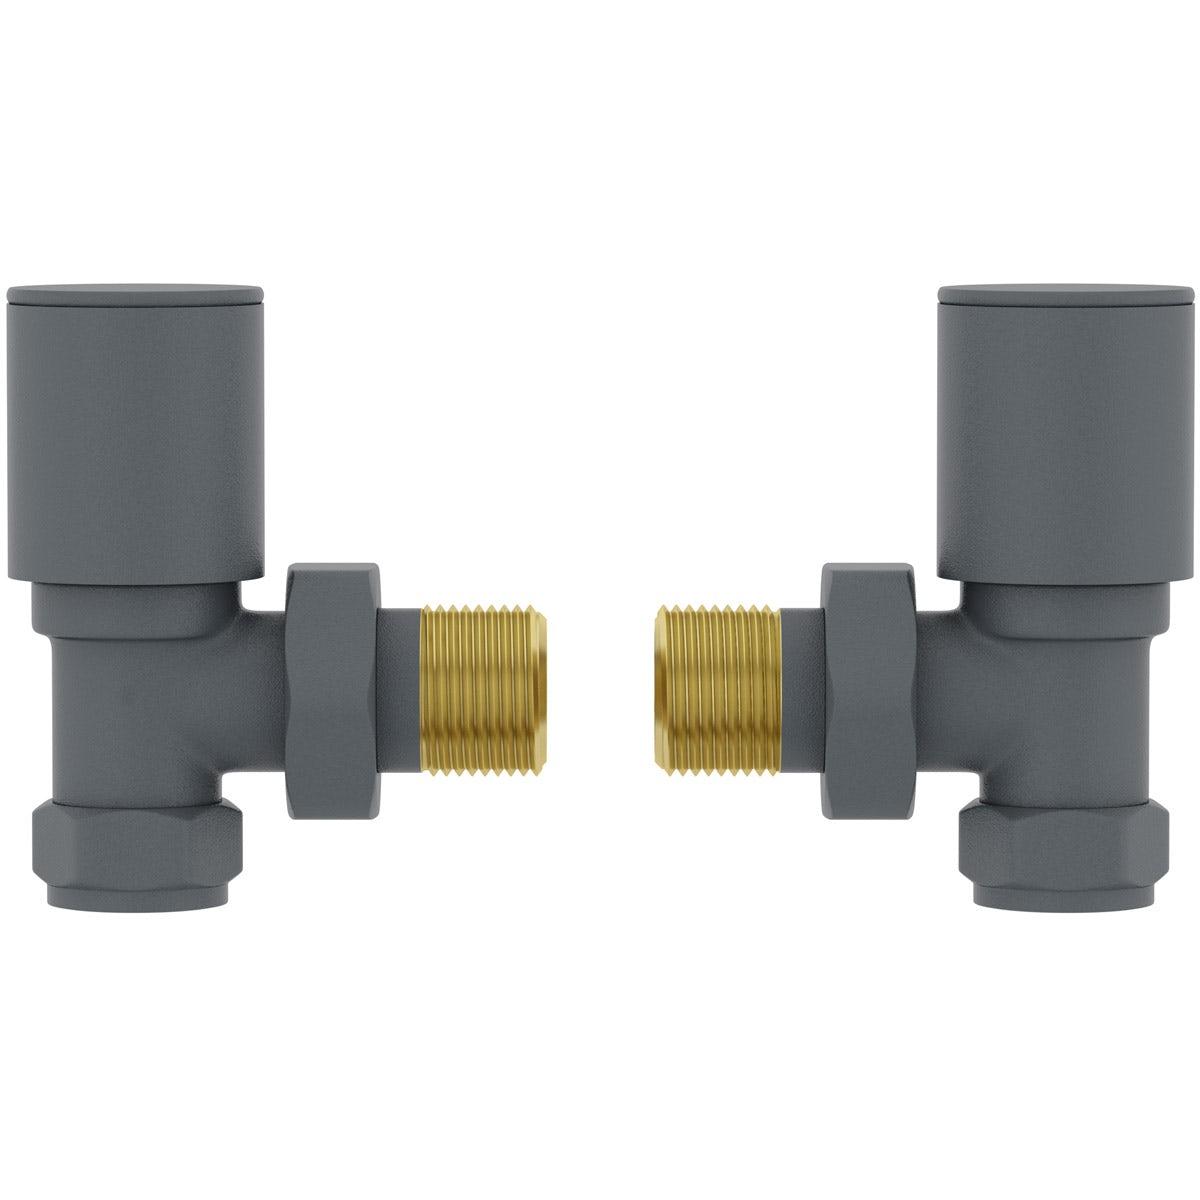 Orchard angled anthracite radiator valve